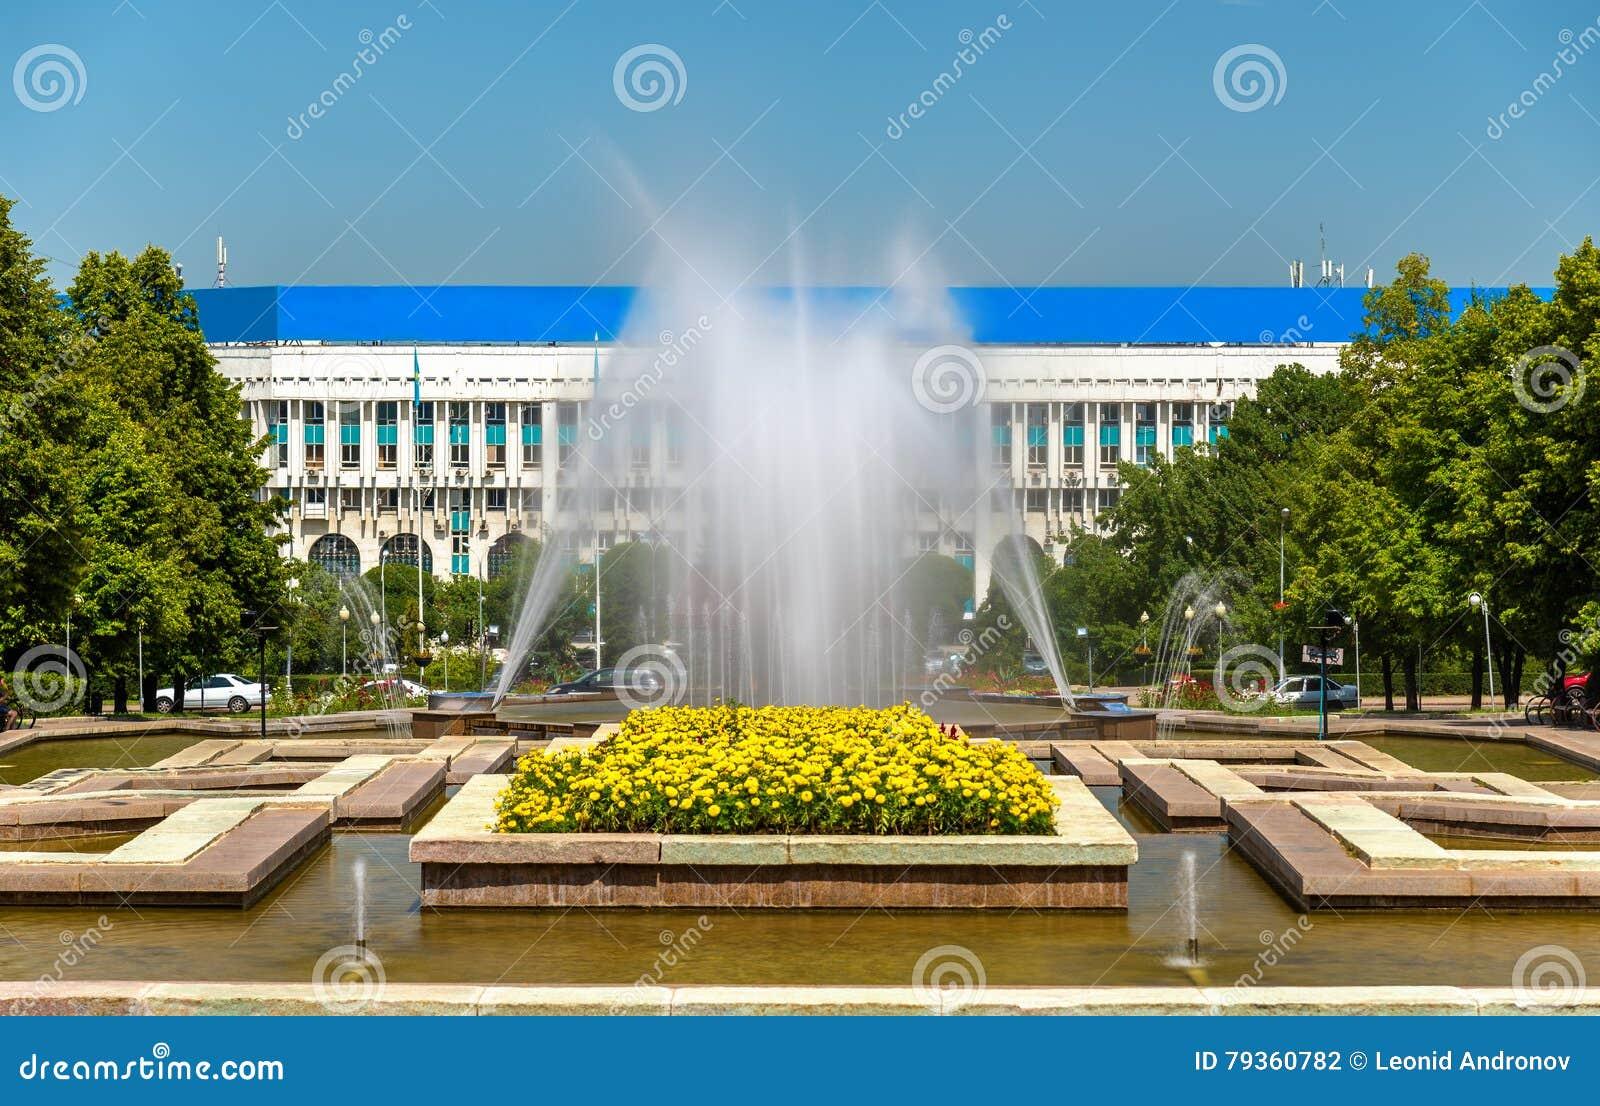 Фонтан на квадрате в Алма-Ате, Казахстане республики